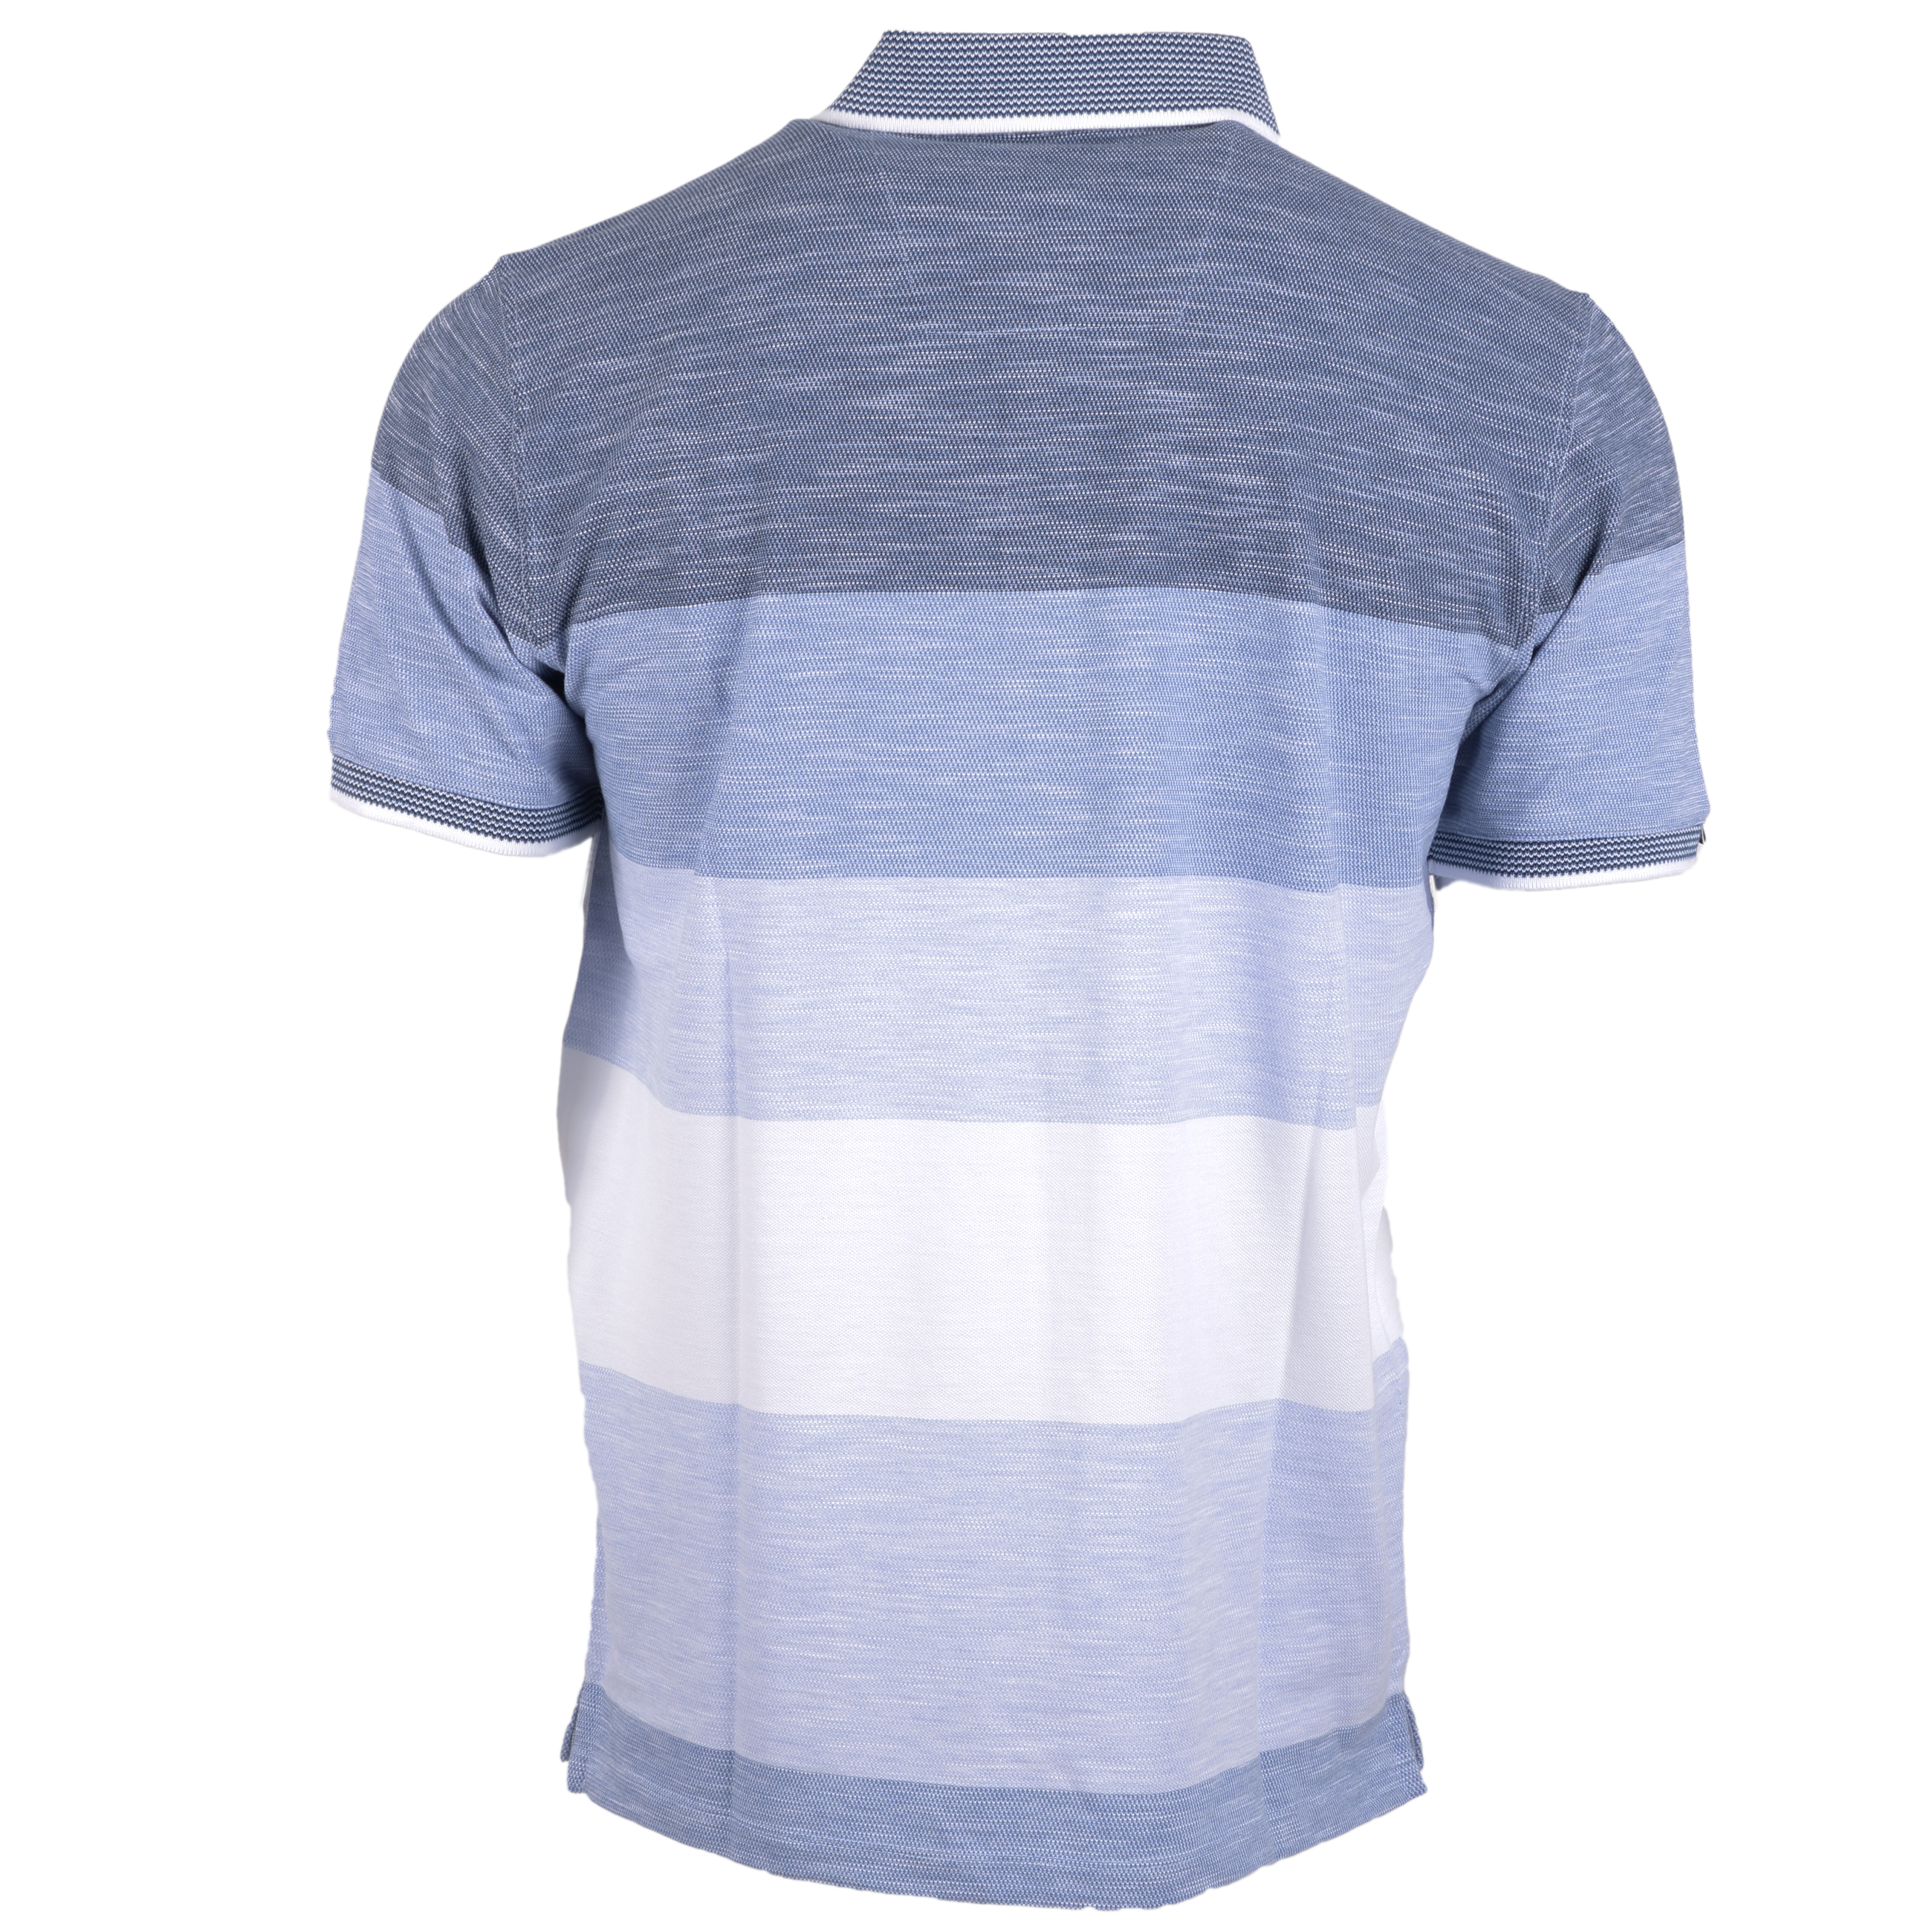 Monte Carlo Herren Poloshirt L